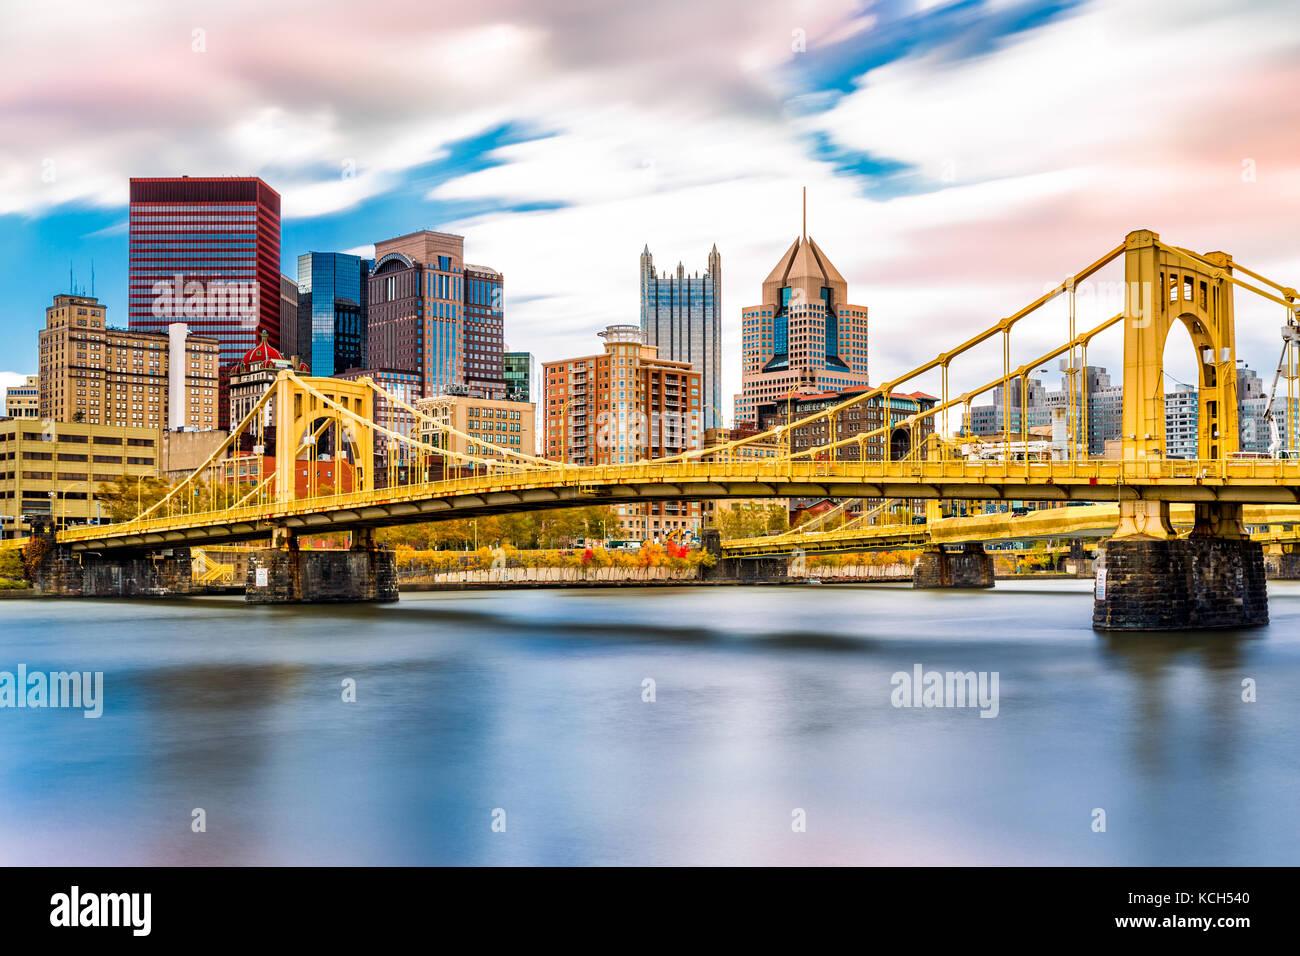 Rachel Carson Bridge (aka Ninth Street Bridge) spans Allegheny river in Pittsburgh, Pennsylvania Stock Photo